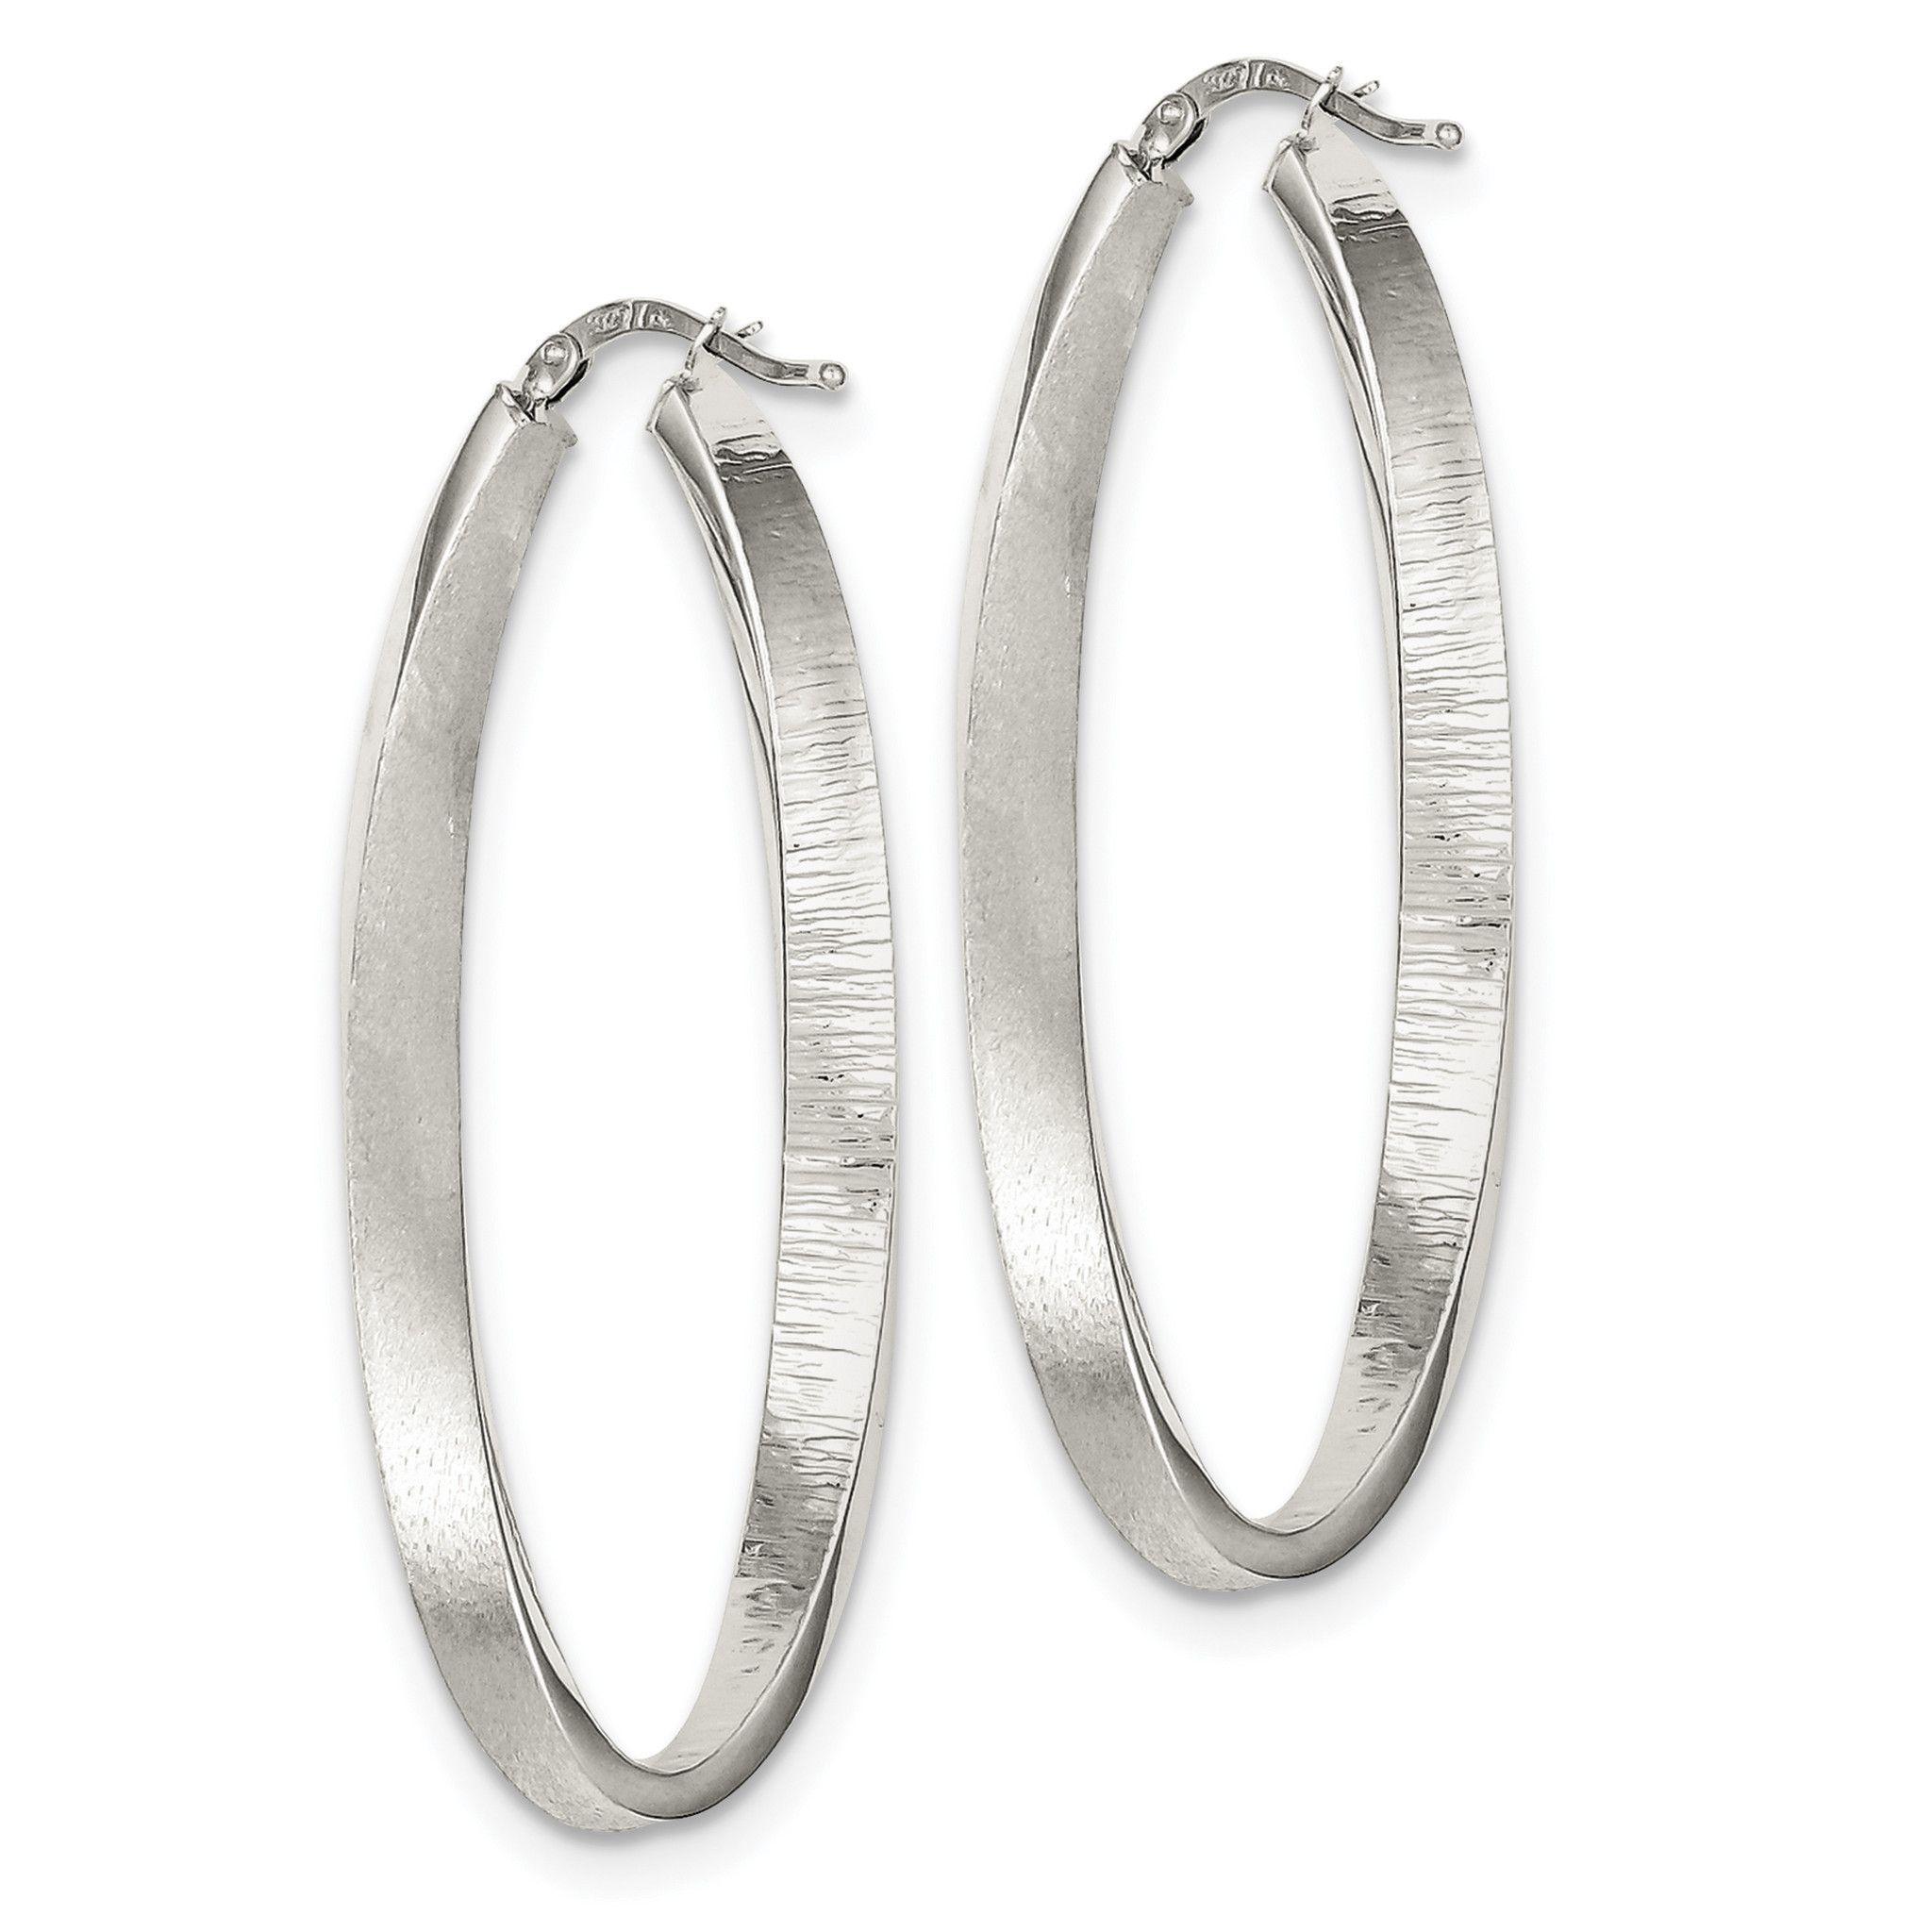 Sterling Silver Brushed & Textured Hollow Oval Hoop Earrings